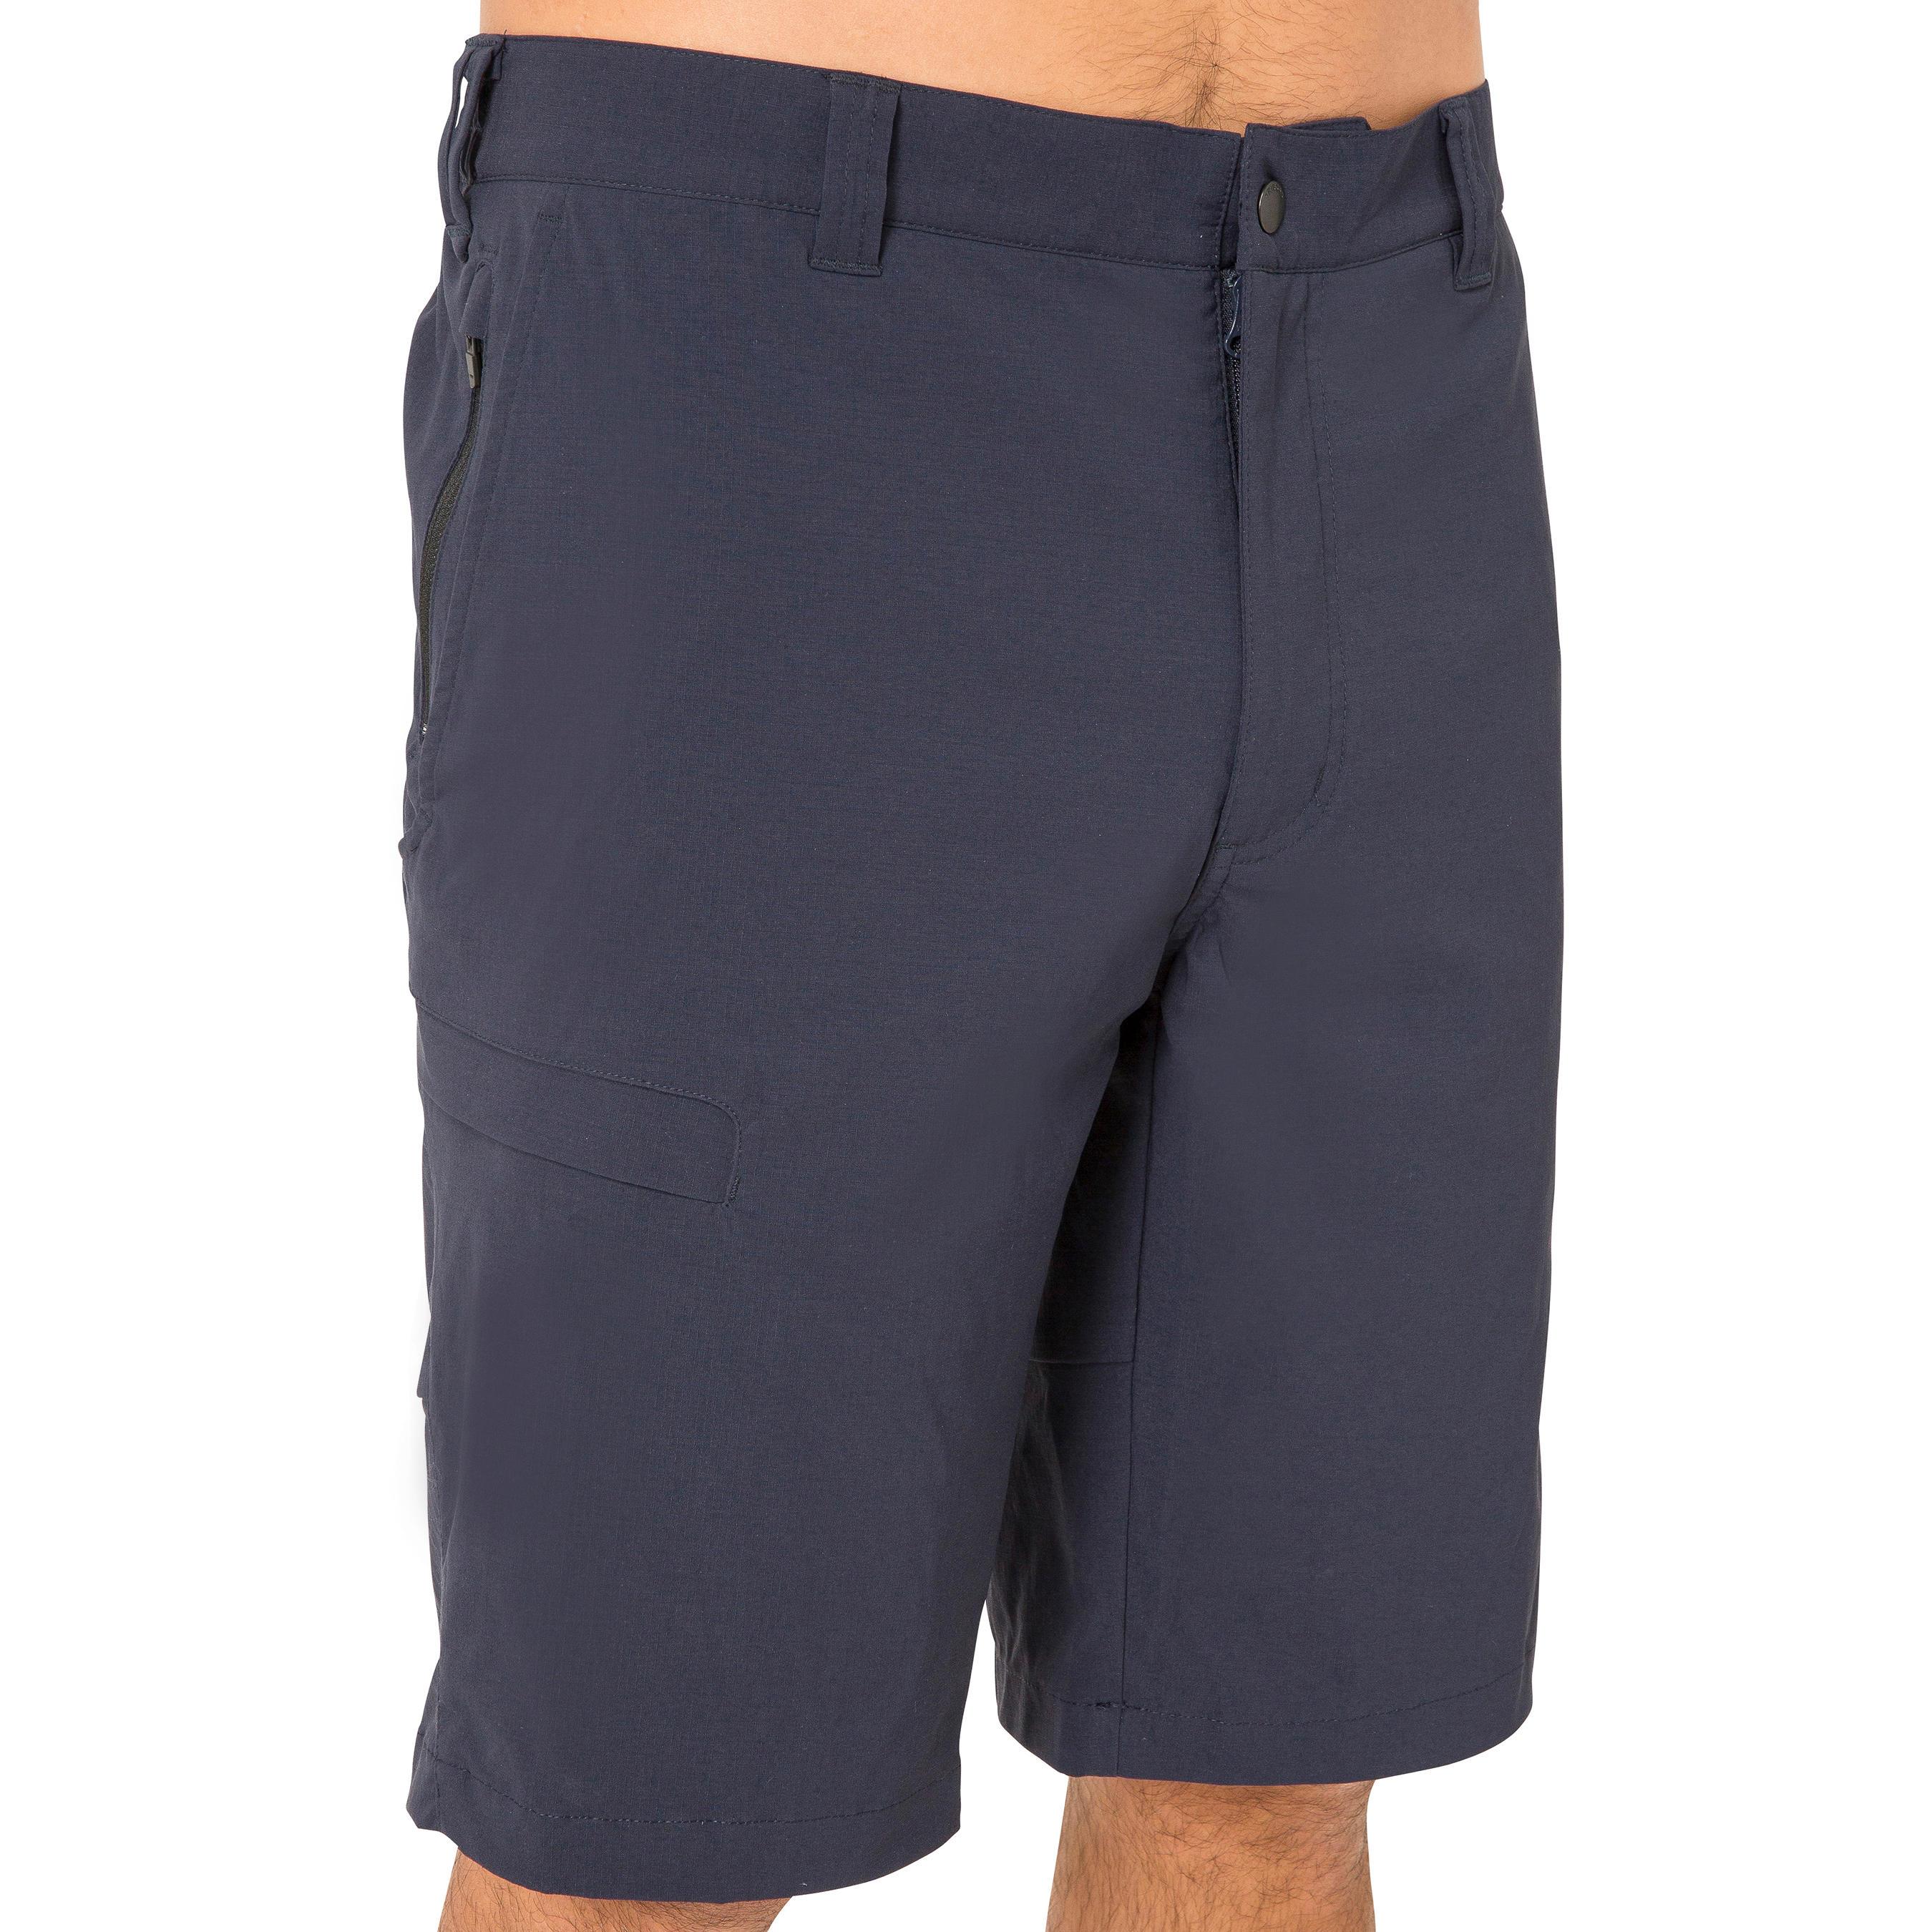 Bermuda shorts for regattas Race men's dark blue